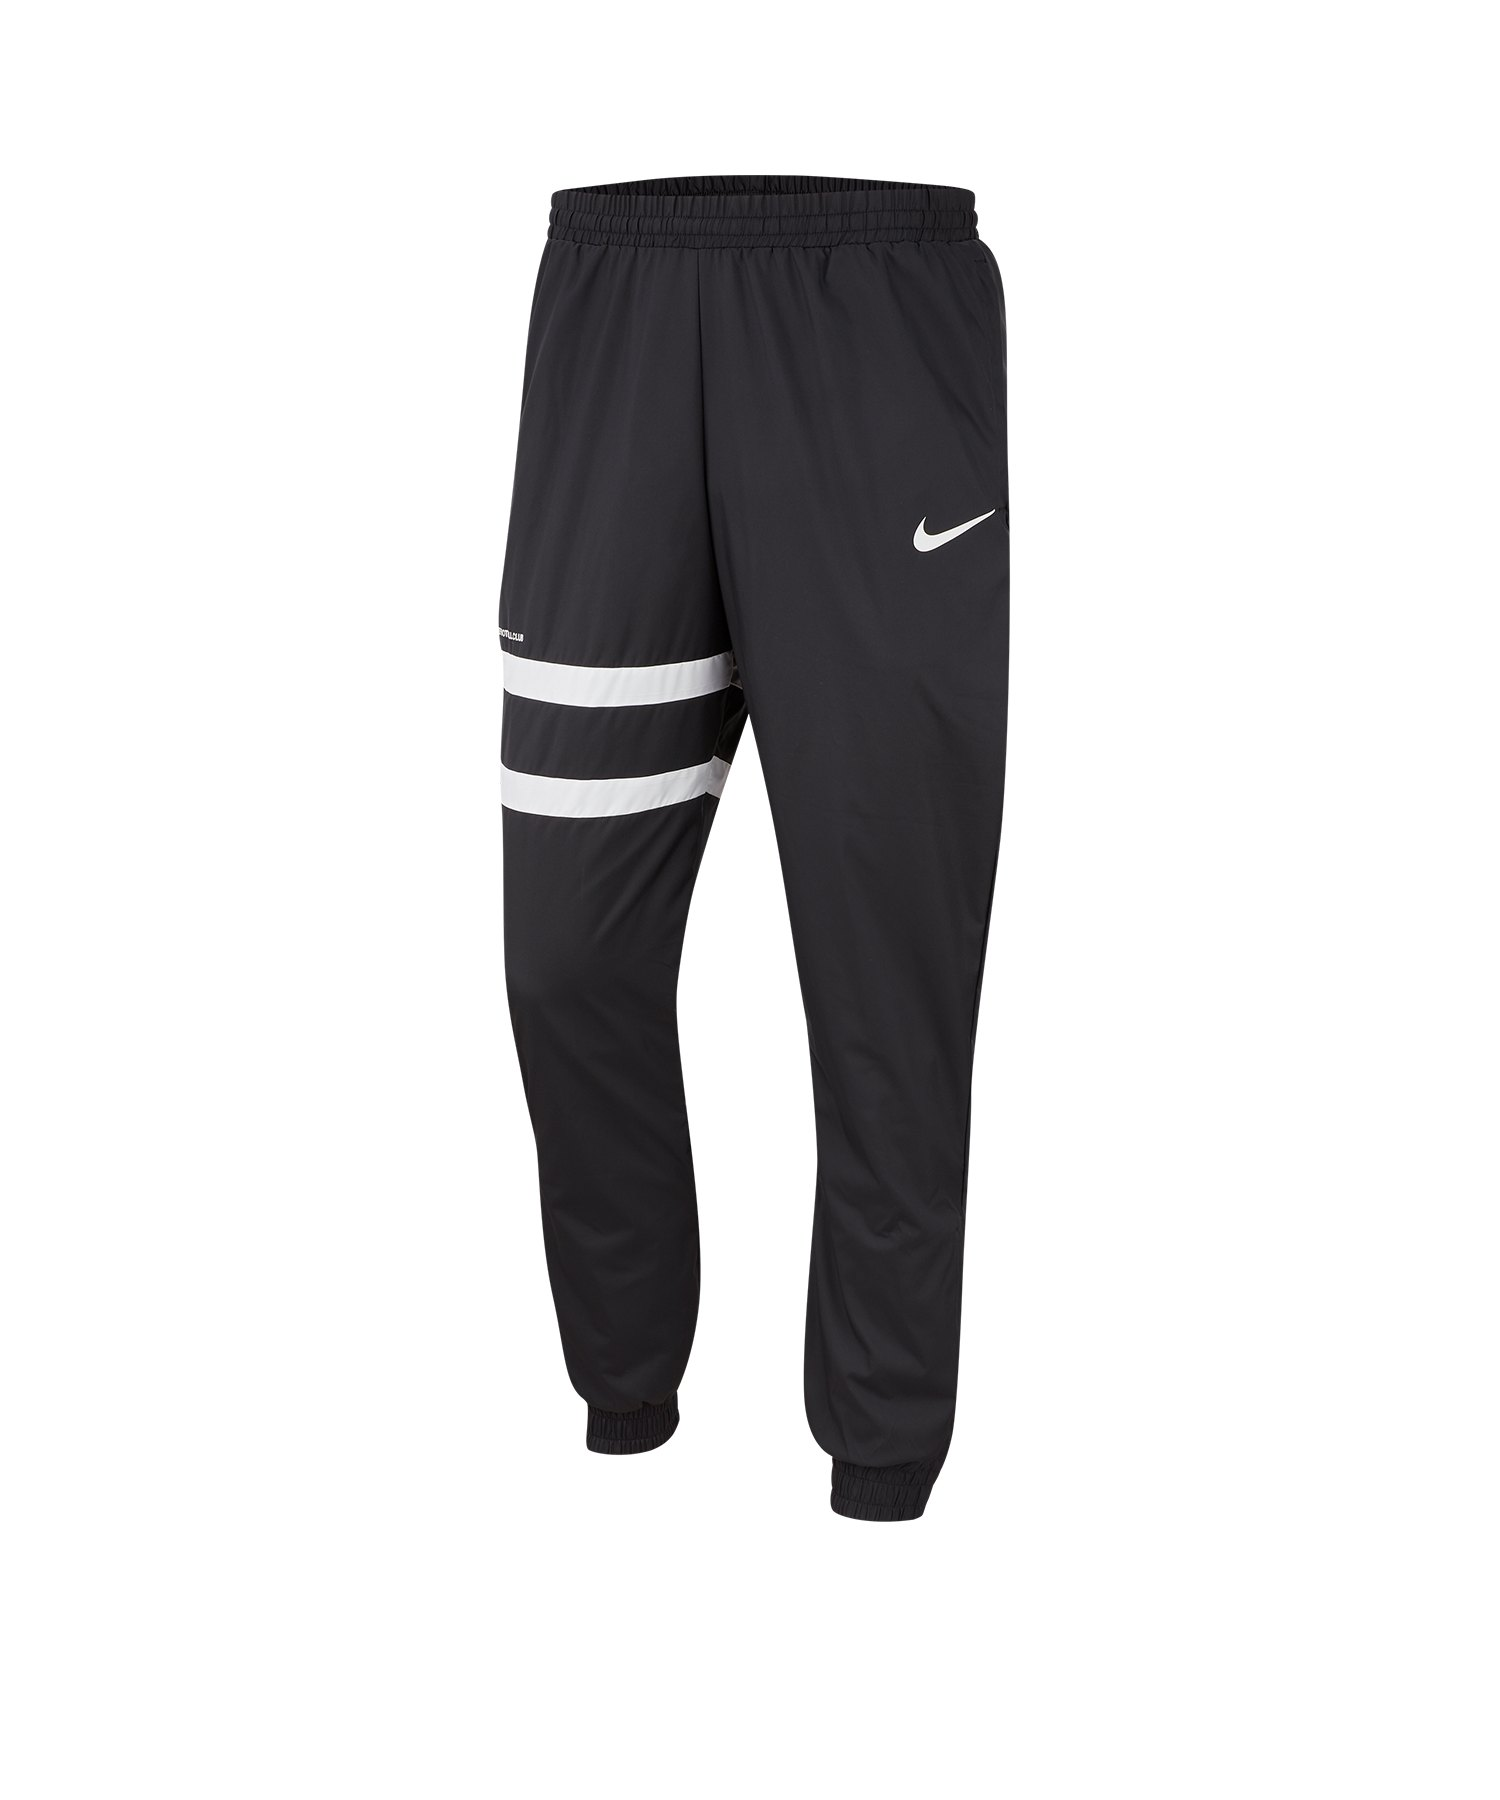 Nike F.C. Track Pant Hose Schwarz F010 - schwarz